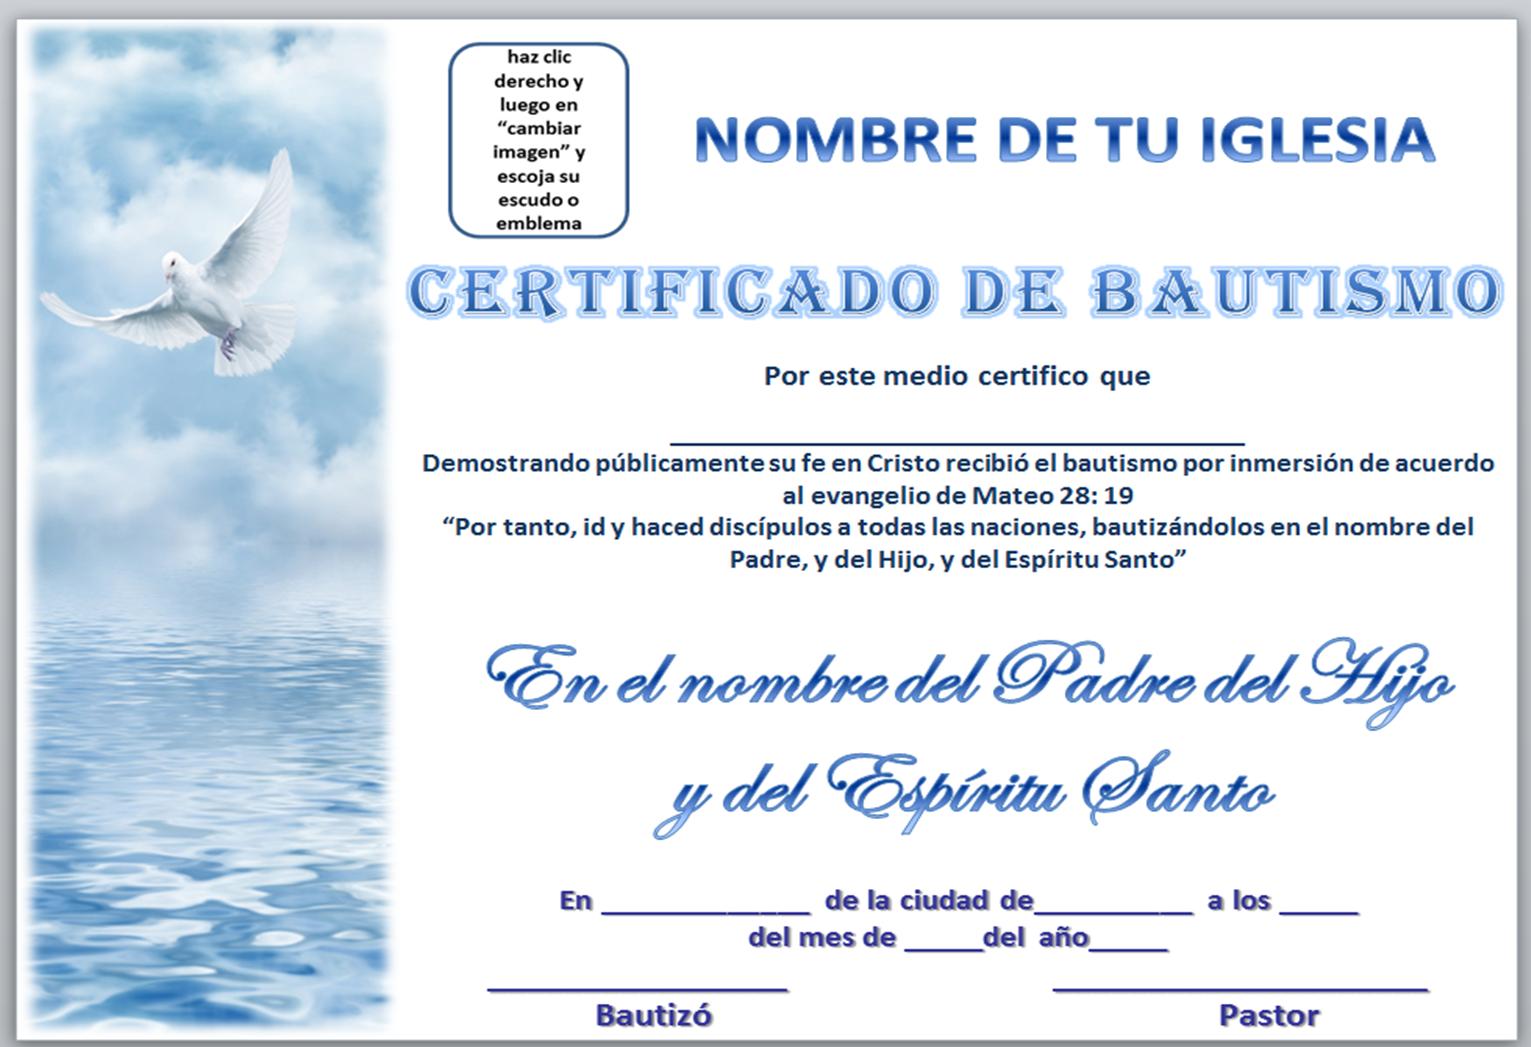 Acta De Matrimonio Catolico : Iglesia mar abierto certificados de bautismo para descargar